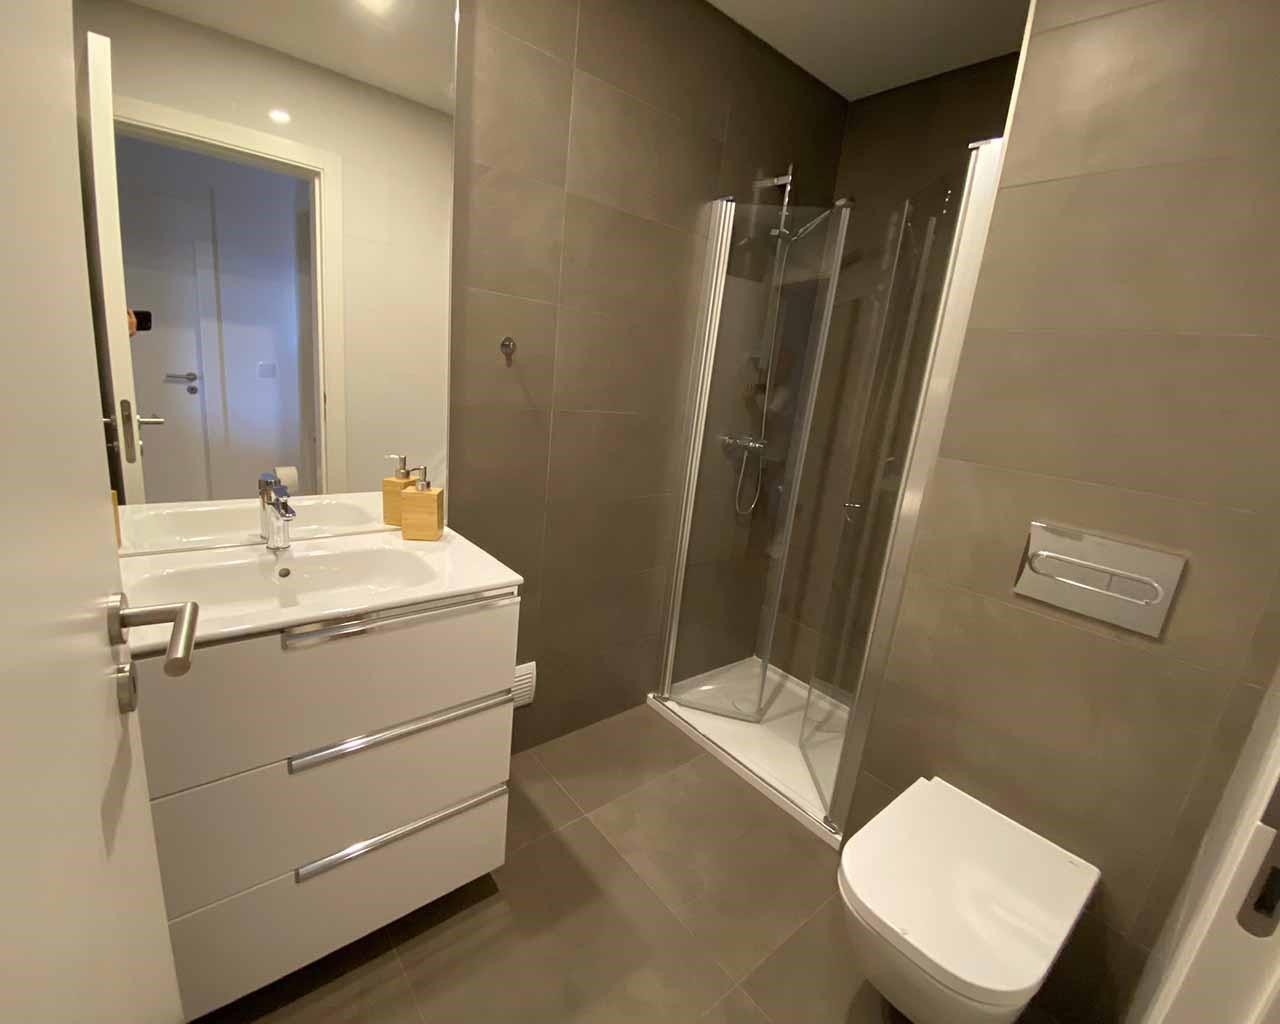 Lux_Terrace_17_2B - Salle de bain2